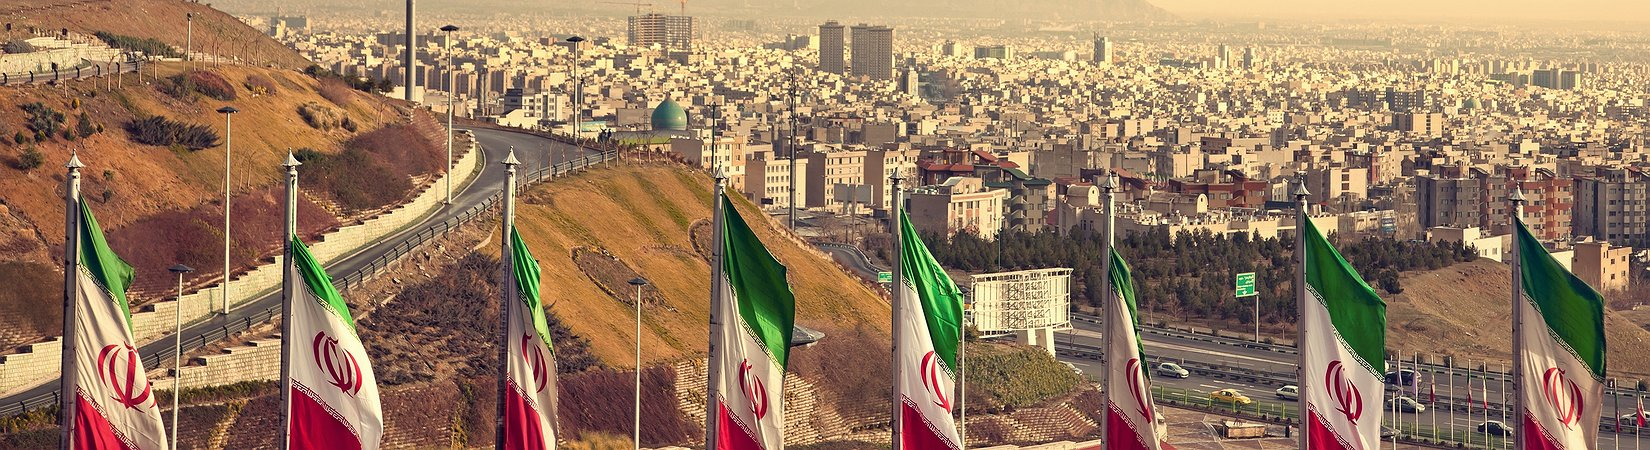 Irán comienza a aceptar solicitudes para proyectos de energía